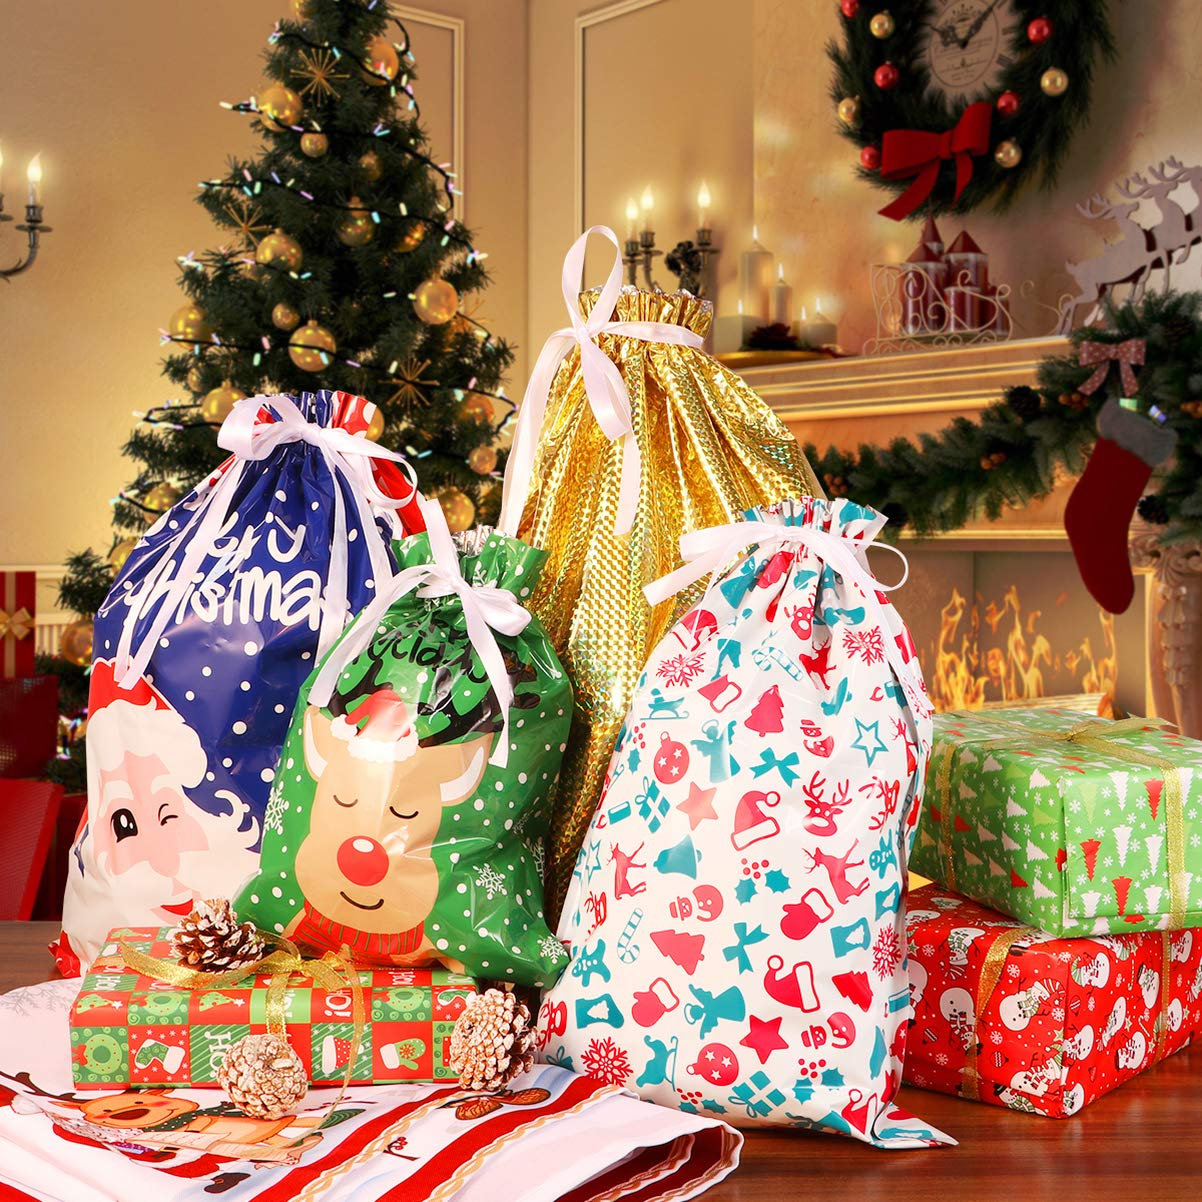 BESTOYARD Christmas Drawstring Gift Bags Goodie Bags Assorted Christmas Prints Treat Gift Bags for Christmas Party Favors Decoration Holiday Favour Drawstring